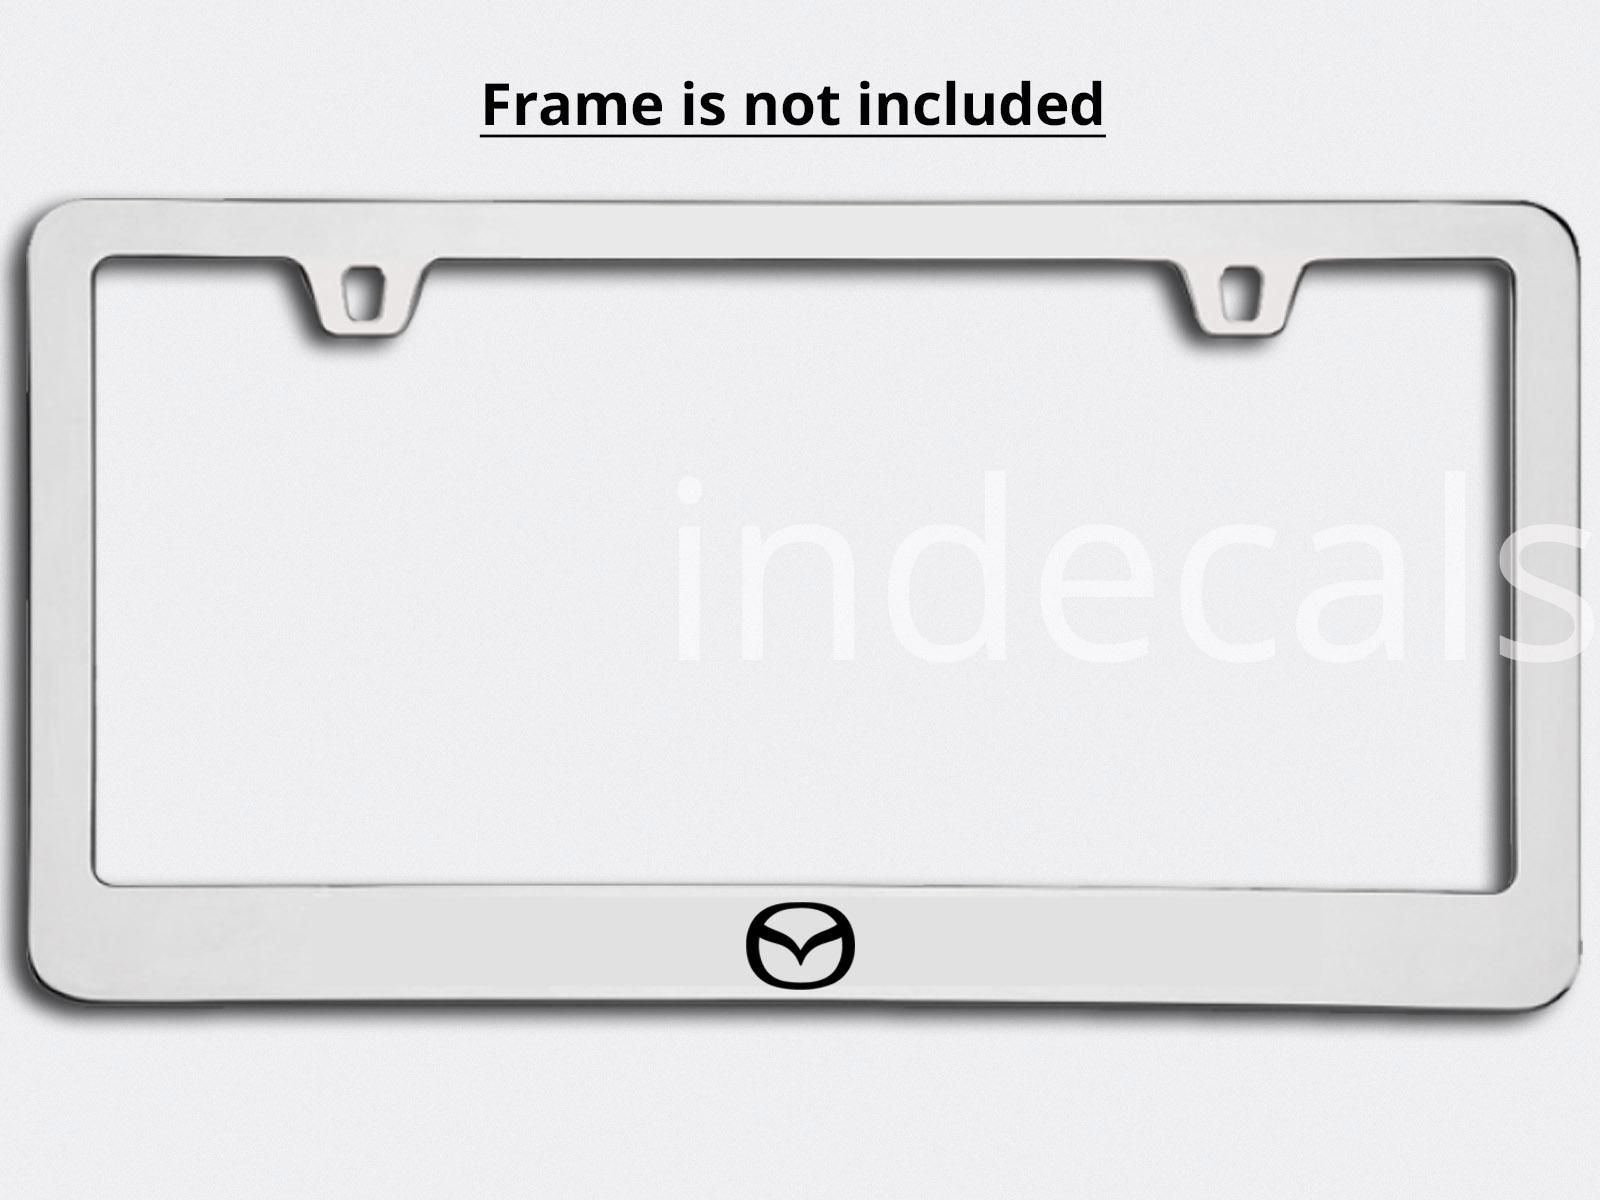 3 x Mazda Stickers for License Plate Frame - Black - indecals.com